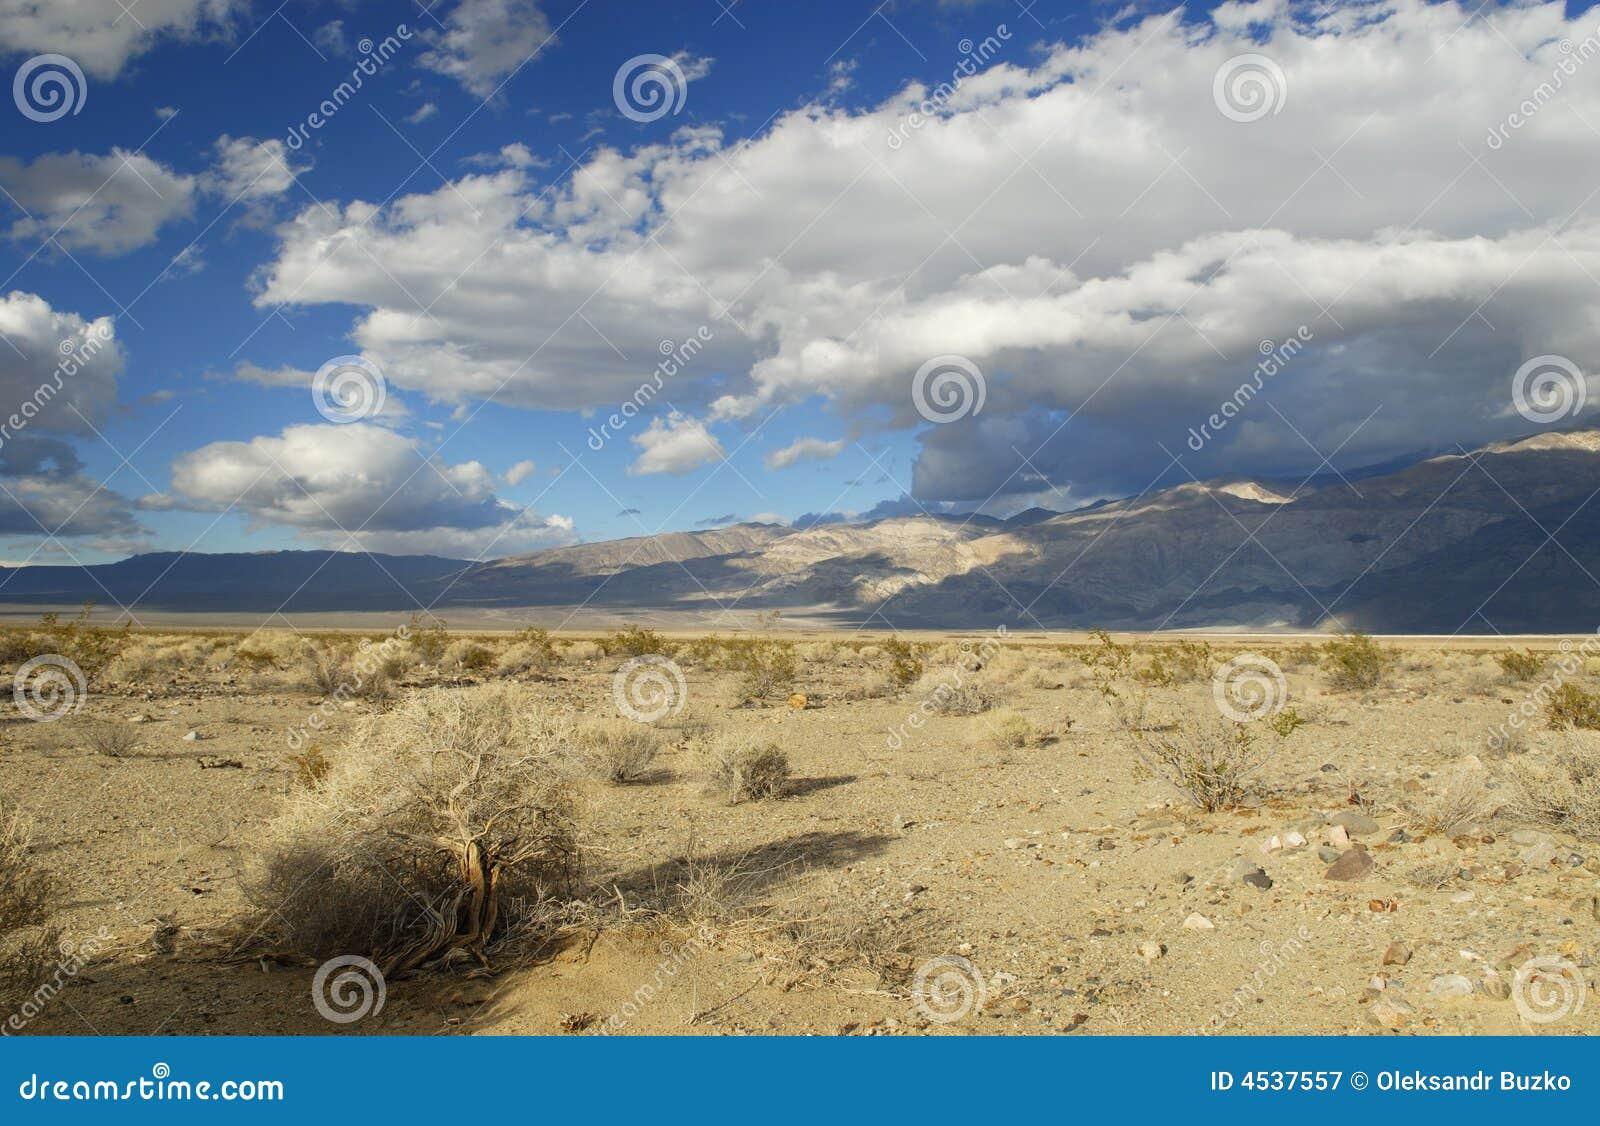 Mojave Desert In American Southwest Royalty Free Stock ...